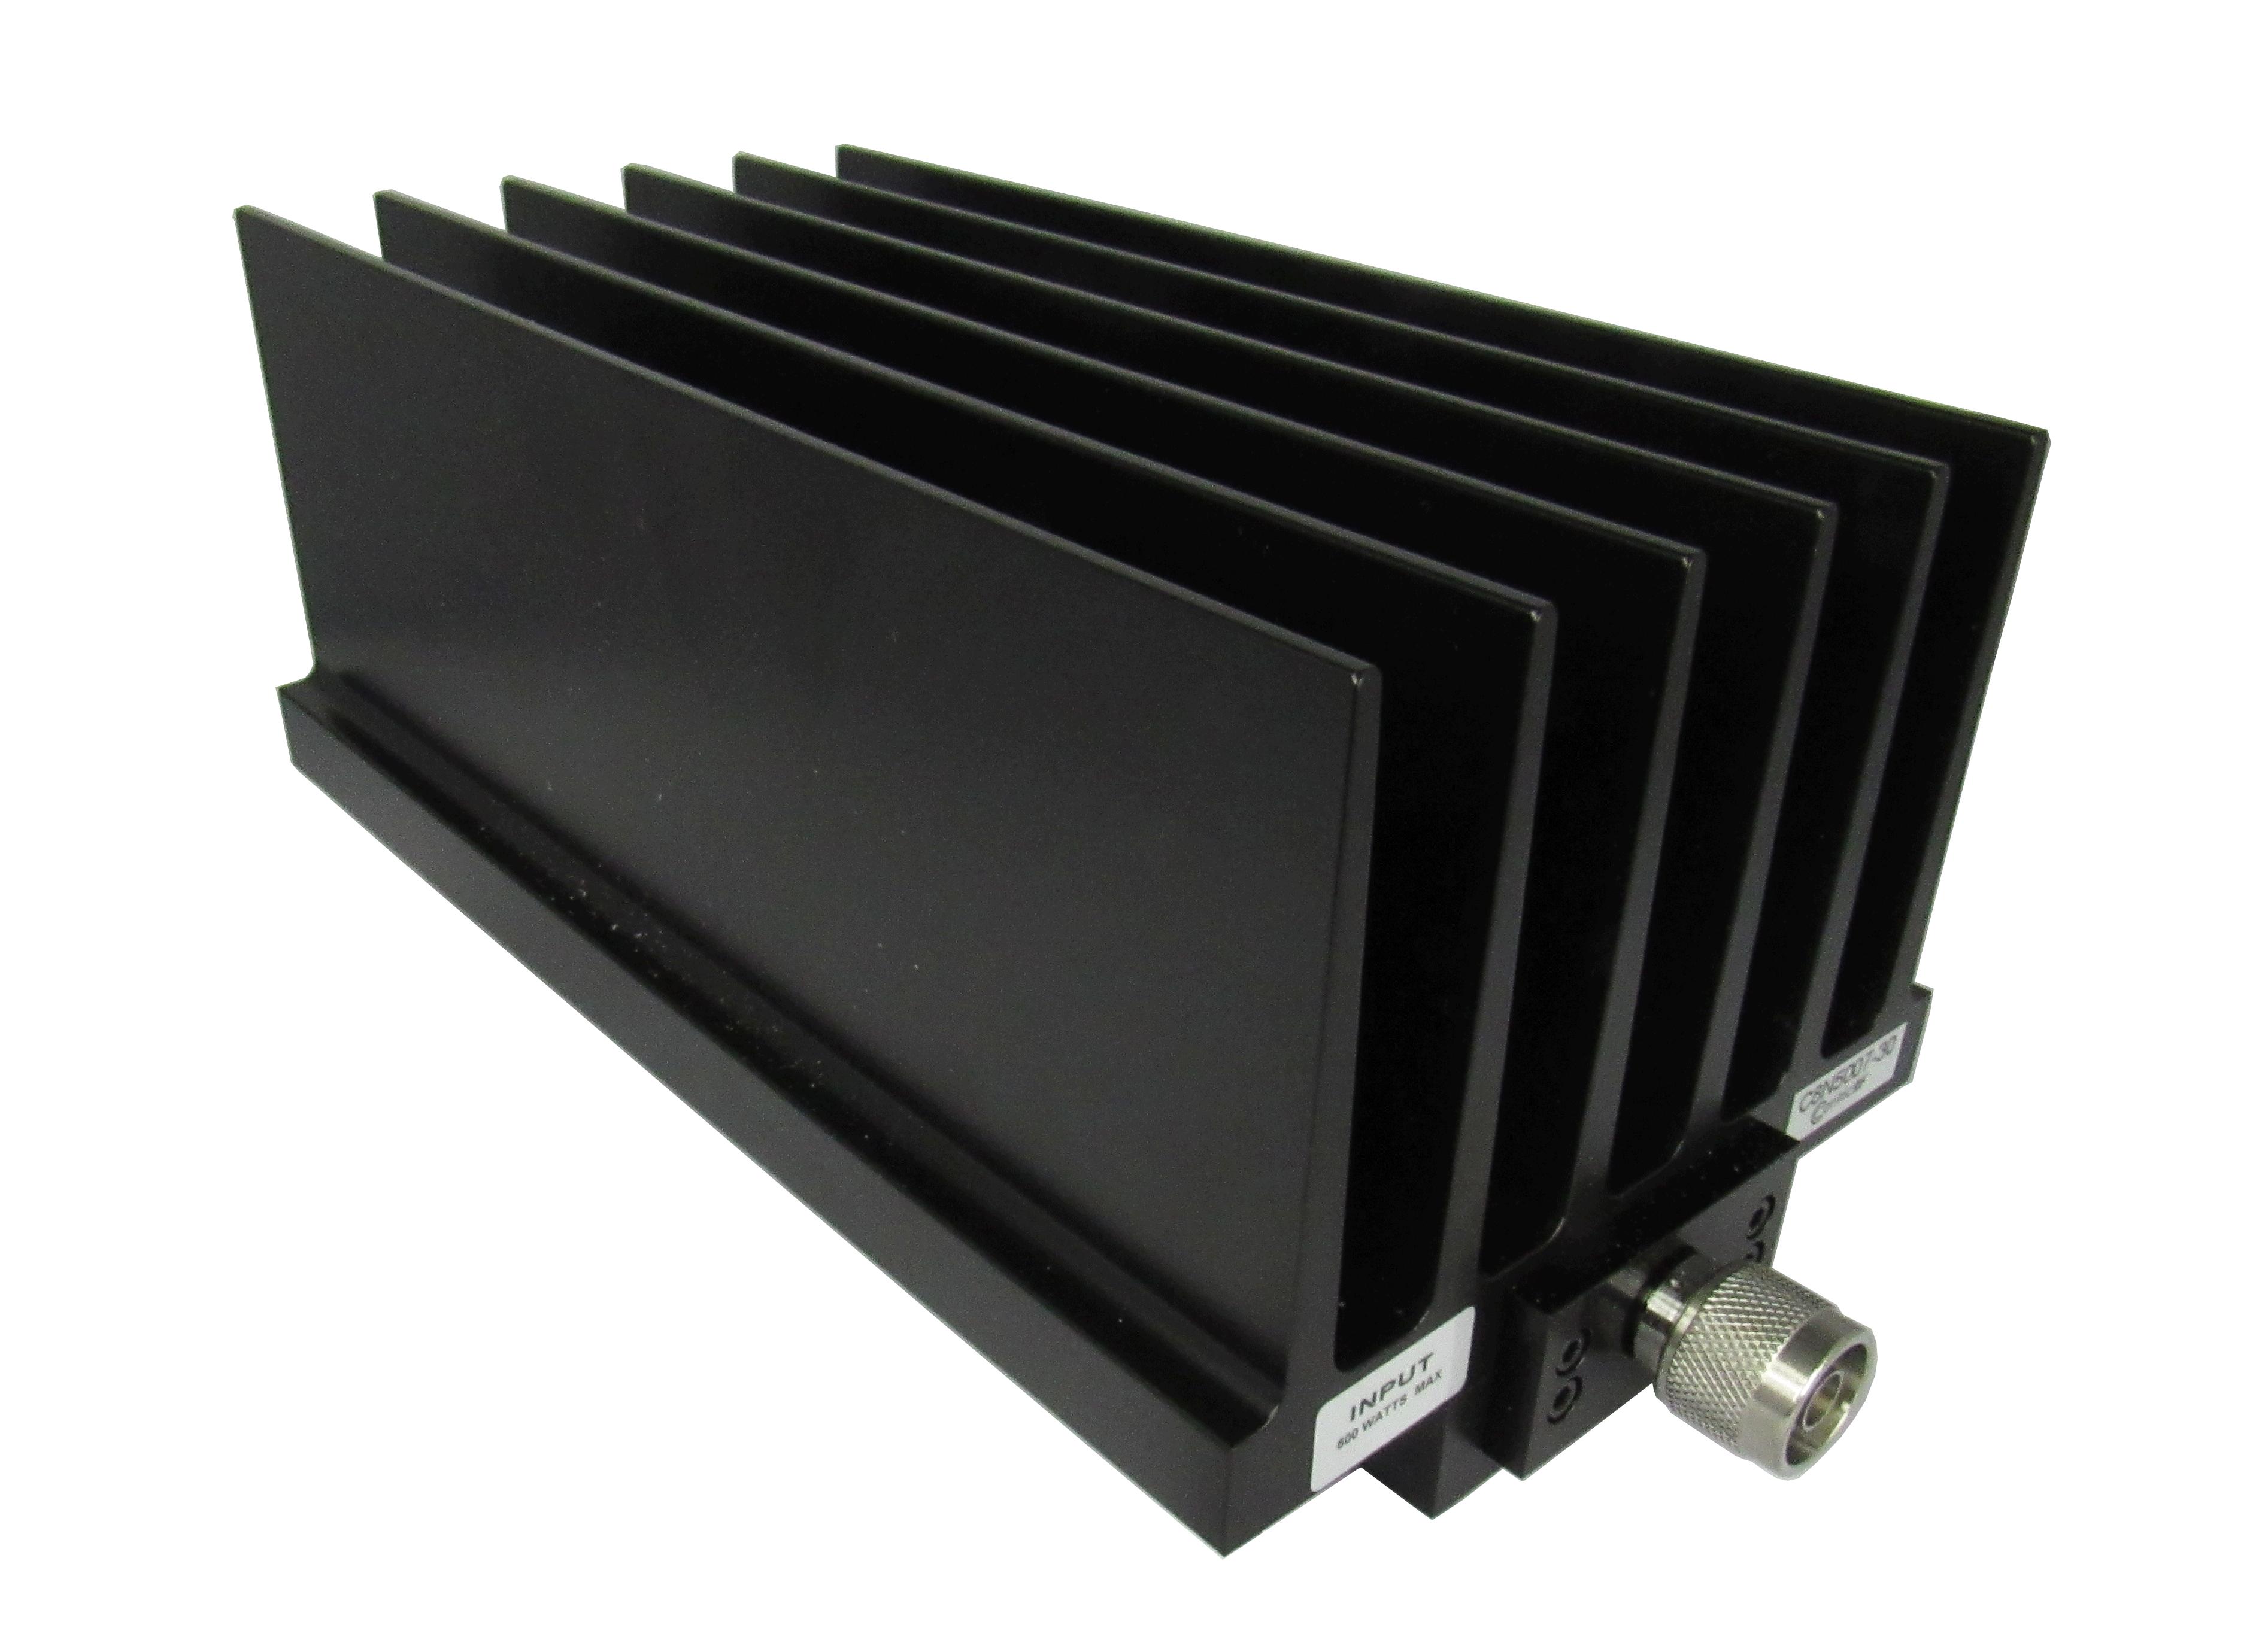 c8n5007-30-n-attenuator-500watt-centric-rf.png